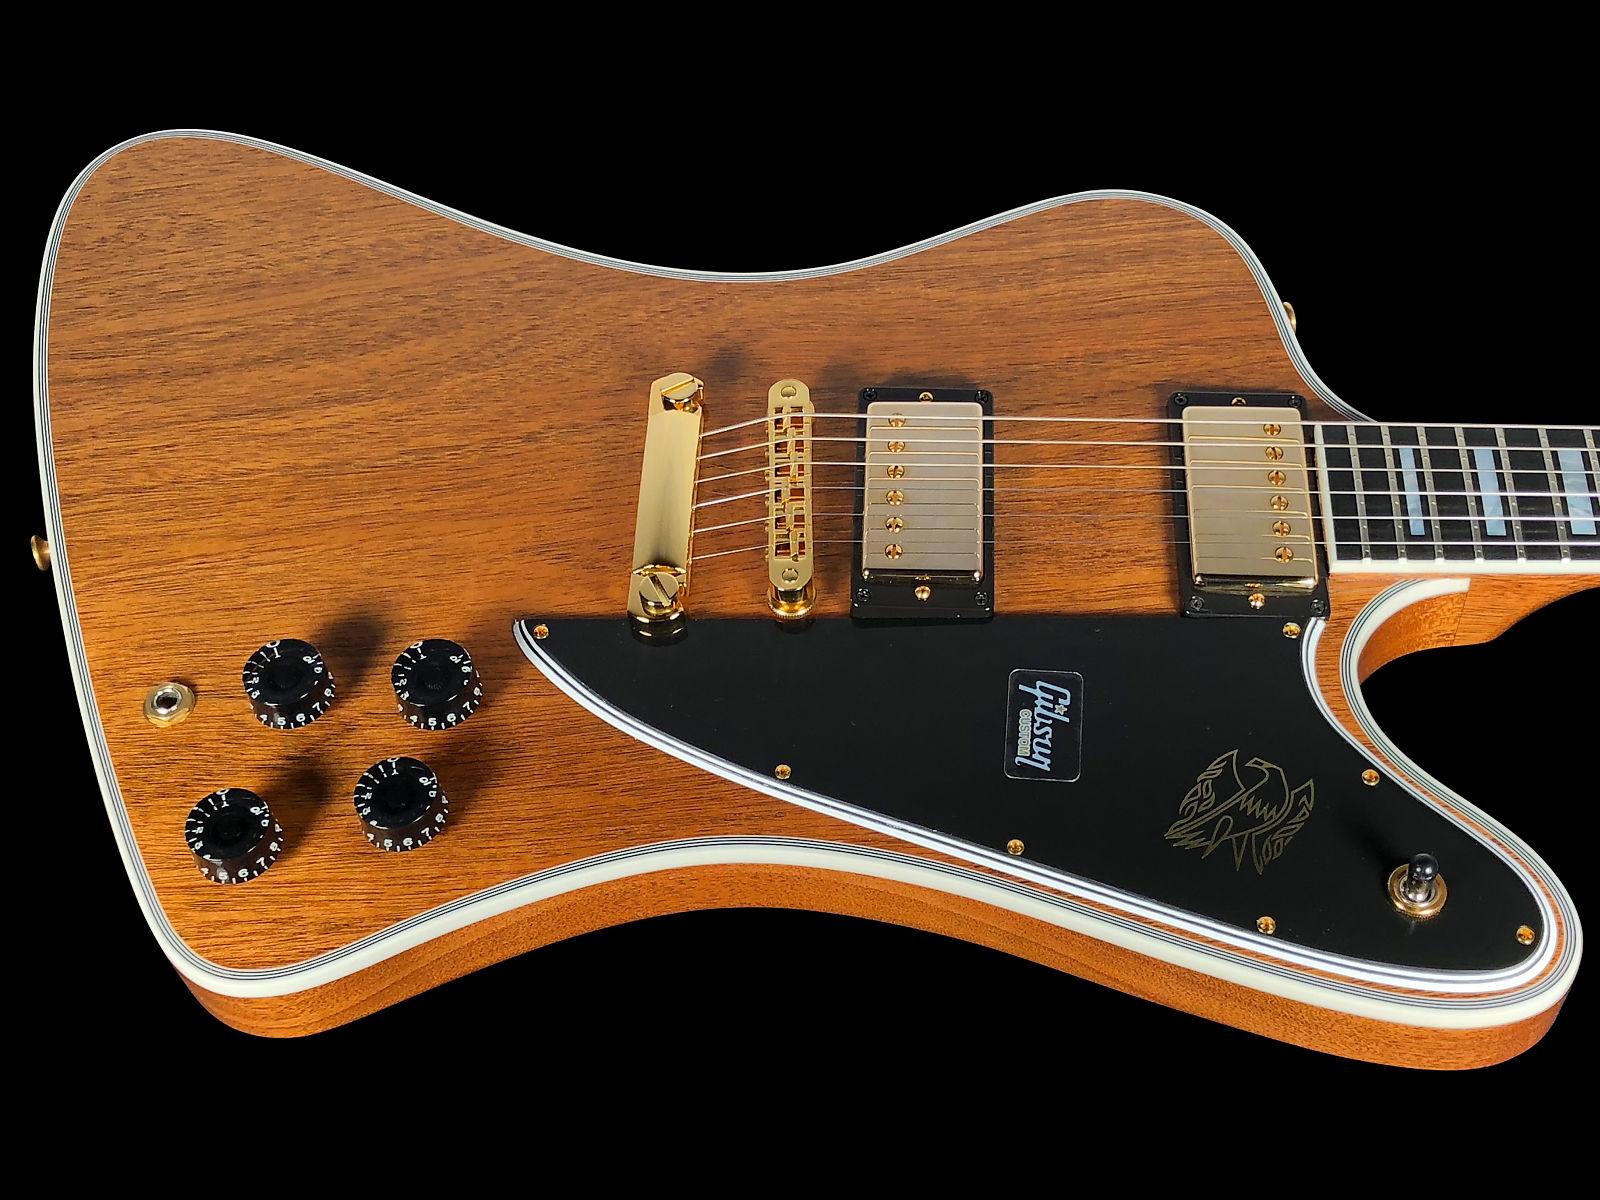 2017 Gibson Firebird Custom Shop Limited Edition ~ Walnut with Gold Hardware